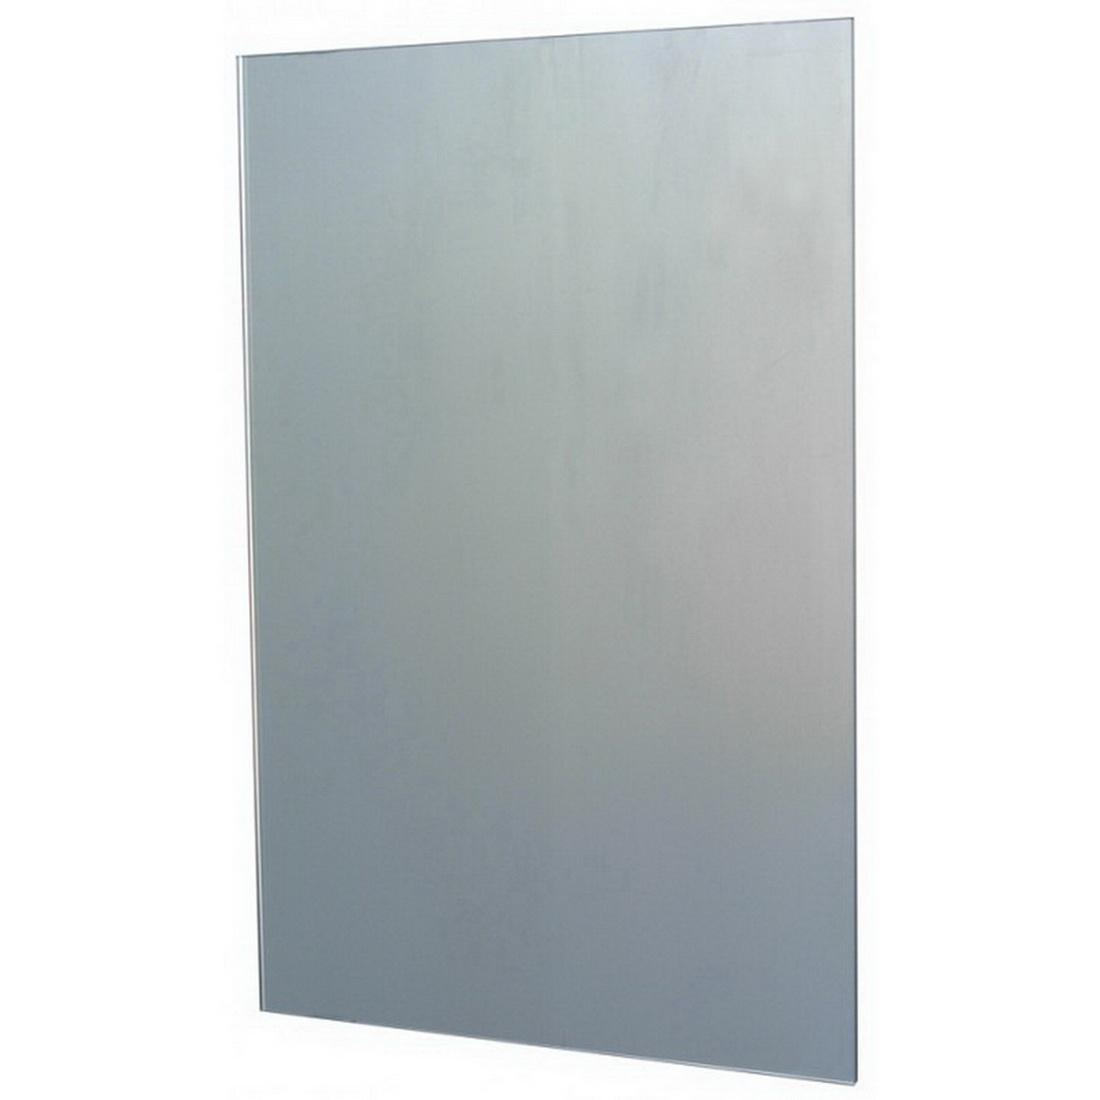 Styline Polished Edge Mirror 900 x 900mm 9X9STYLE